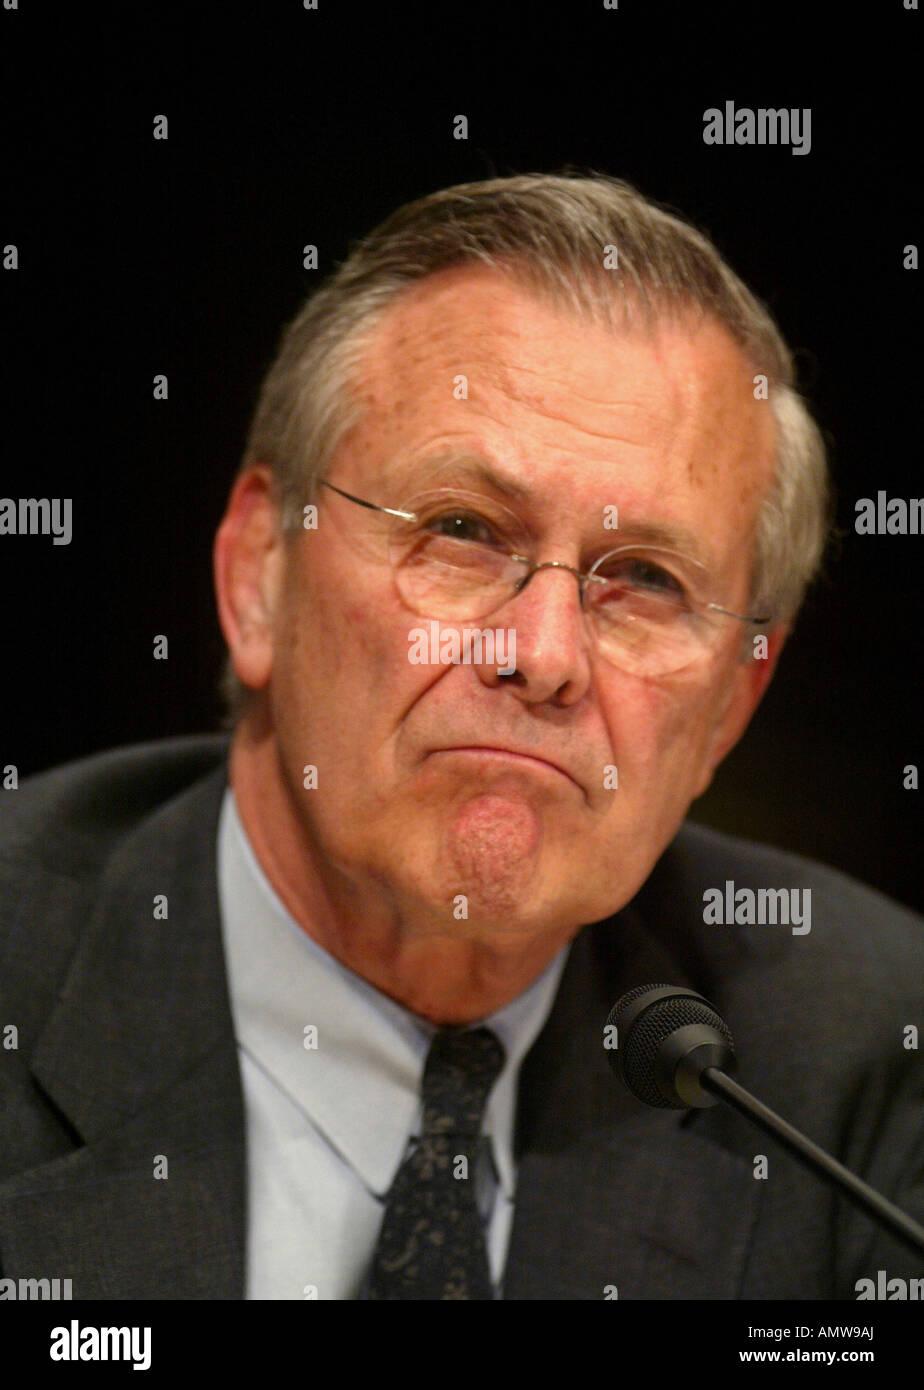 Secretary of Defense Donald Rumsfeld testifies before the Senate Armed Services Committee - Stock Image